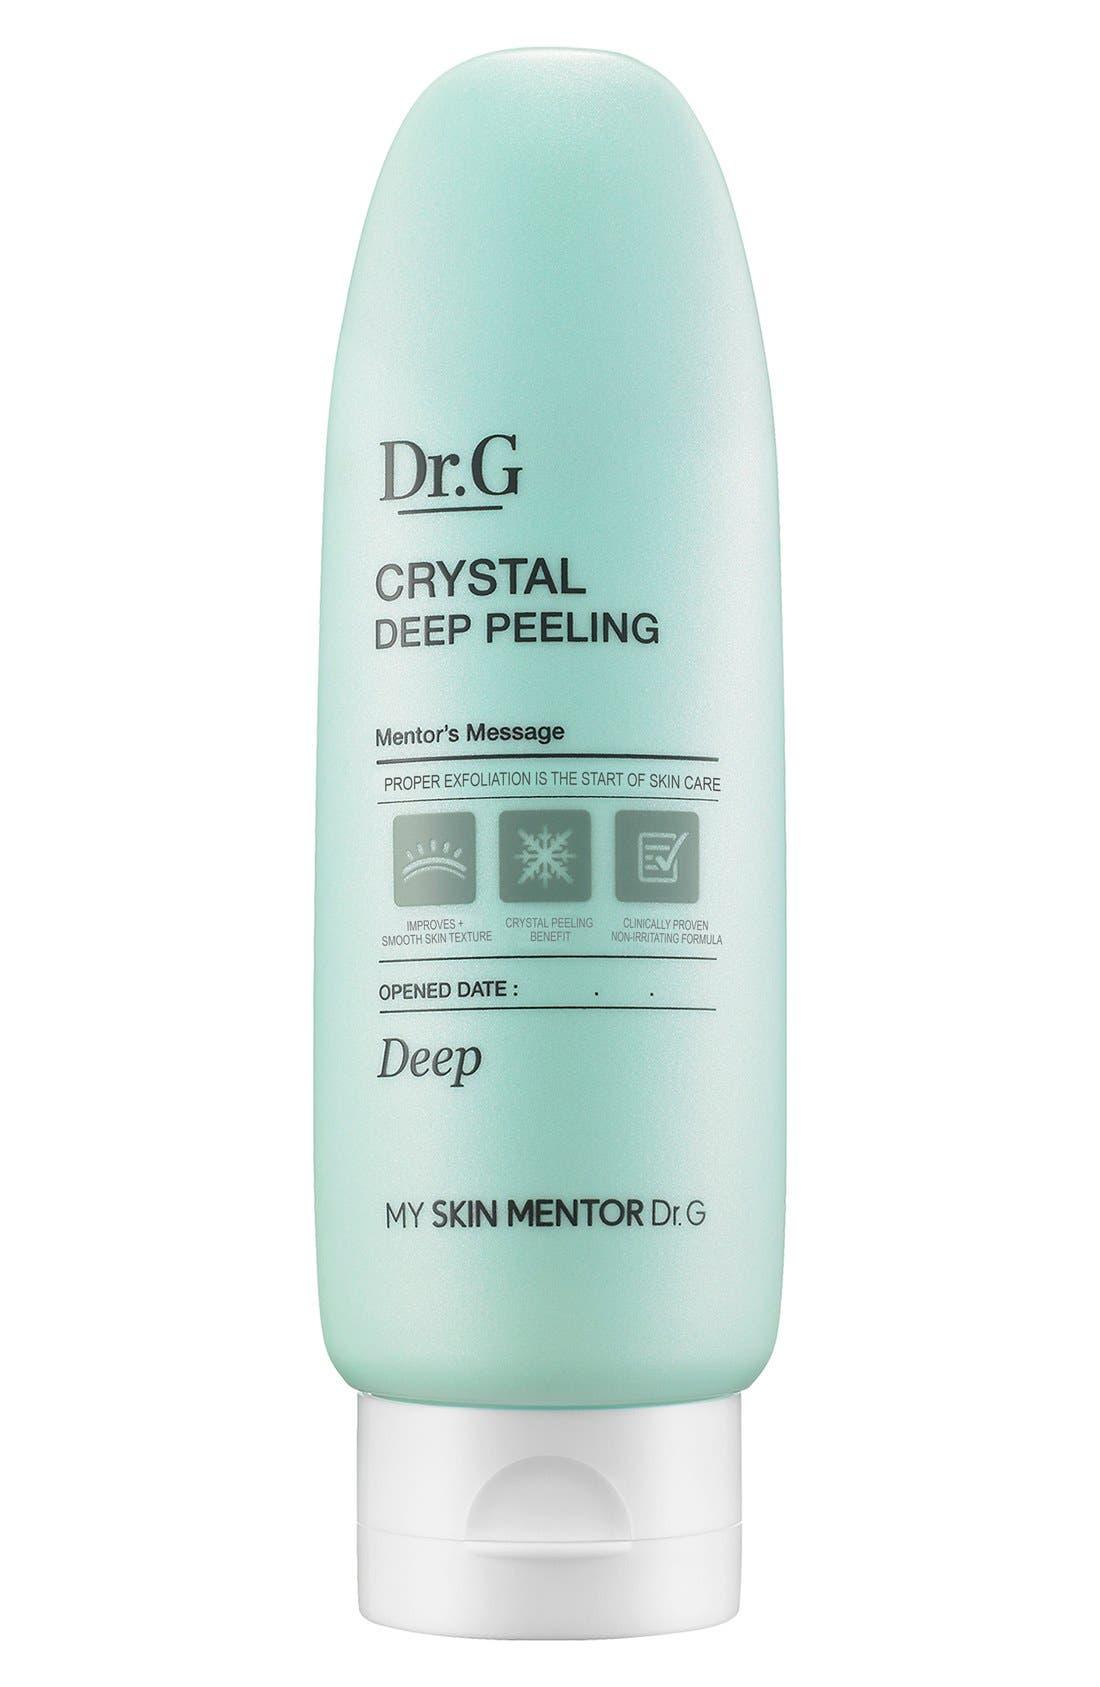 My Skin Mentor Dr. G Beauty Crystal Deep Peeling